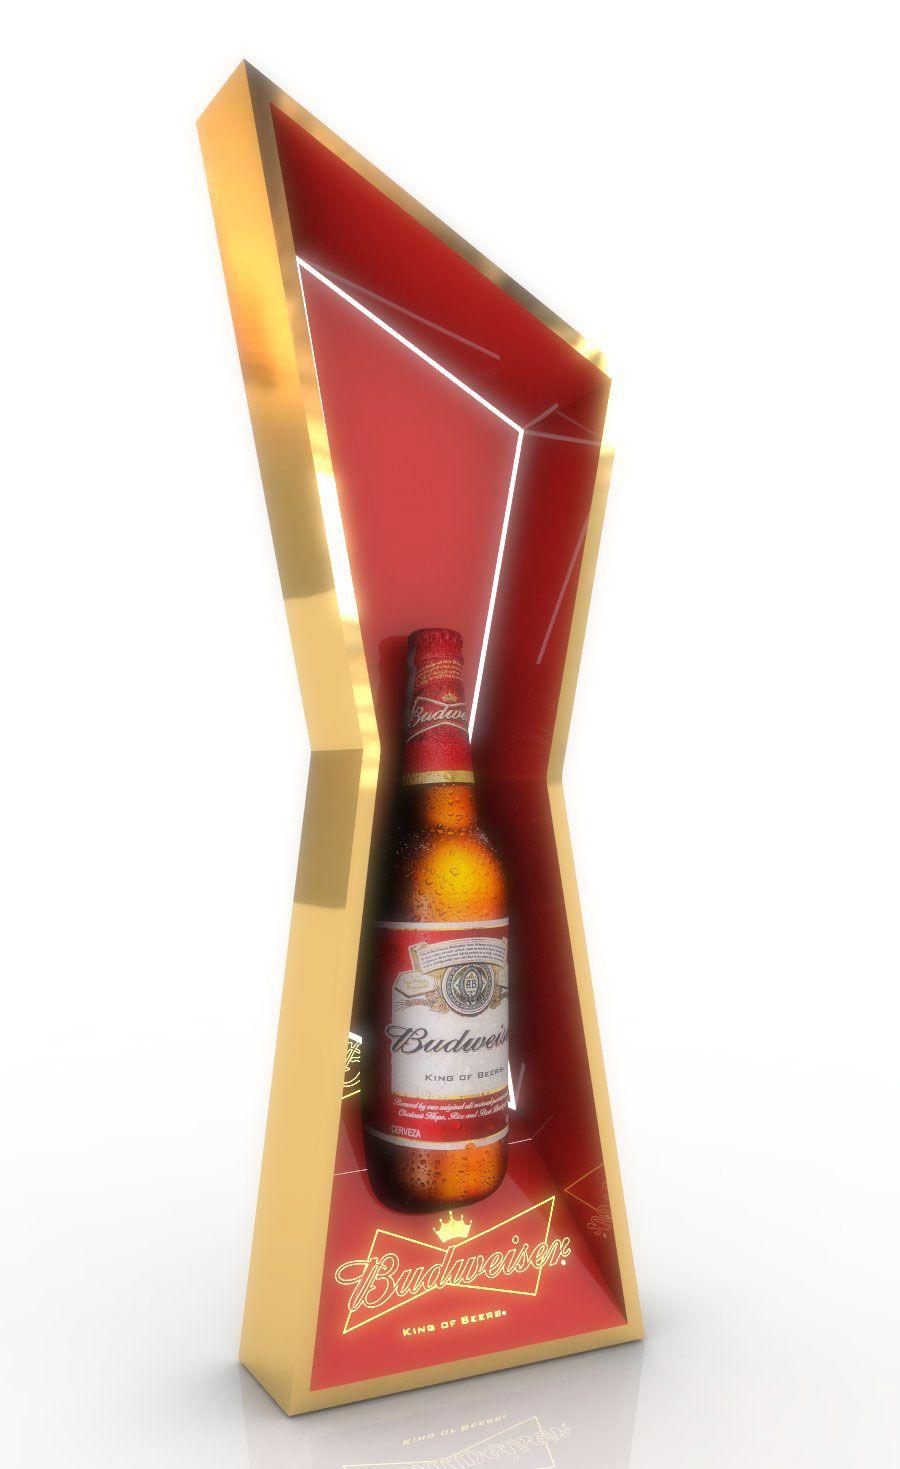 Budweiser Posm On Behance In 2020 Budweiser Wine Display Posm